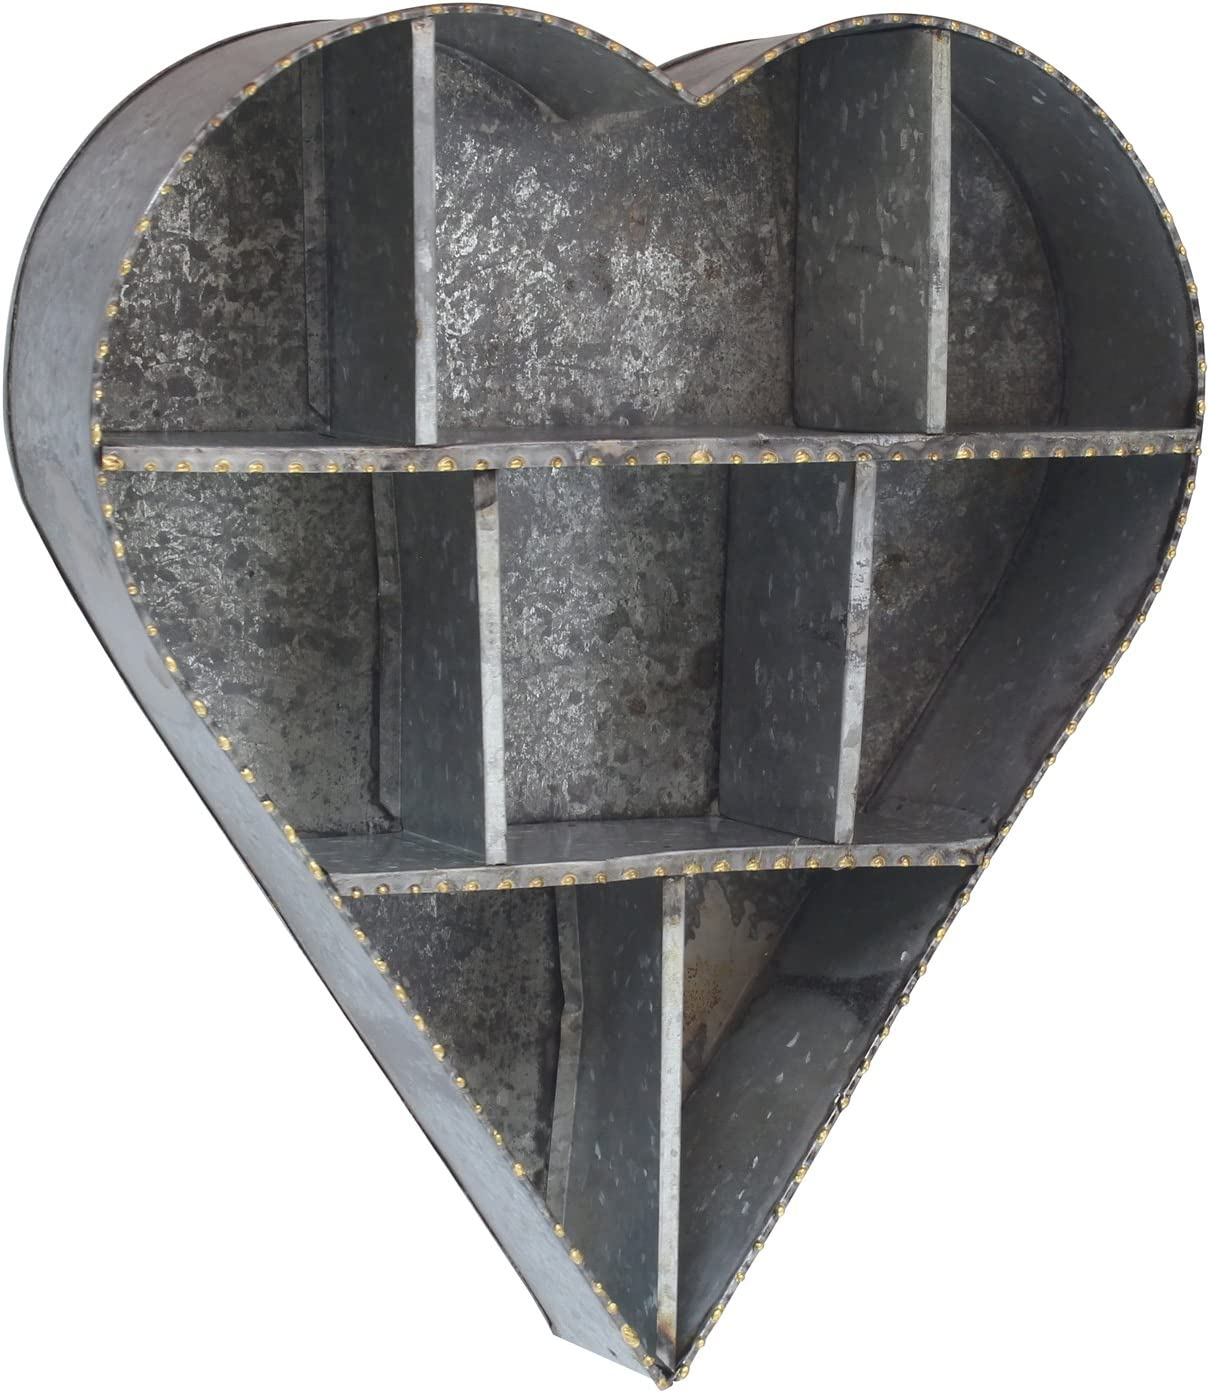 Stonebriar SB-5642A Heart Shape Galvanized Metal Wall Shelf